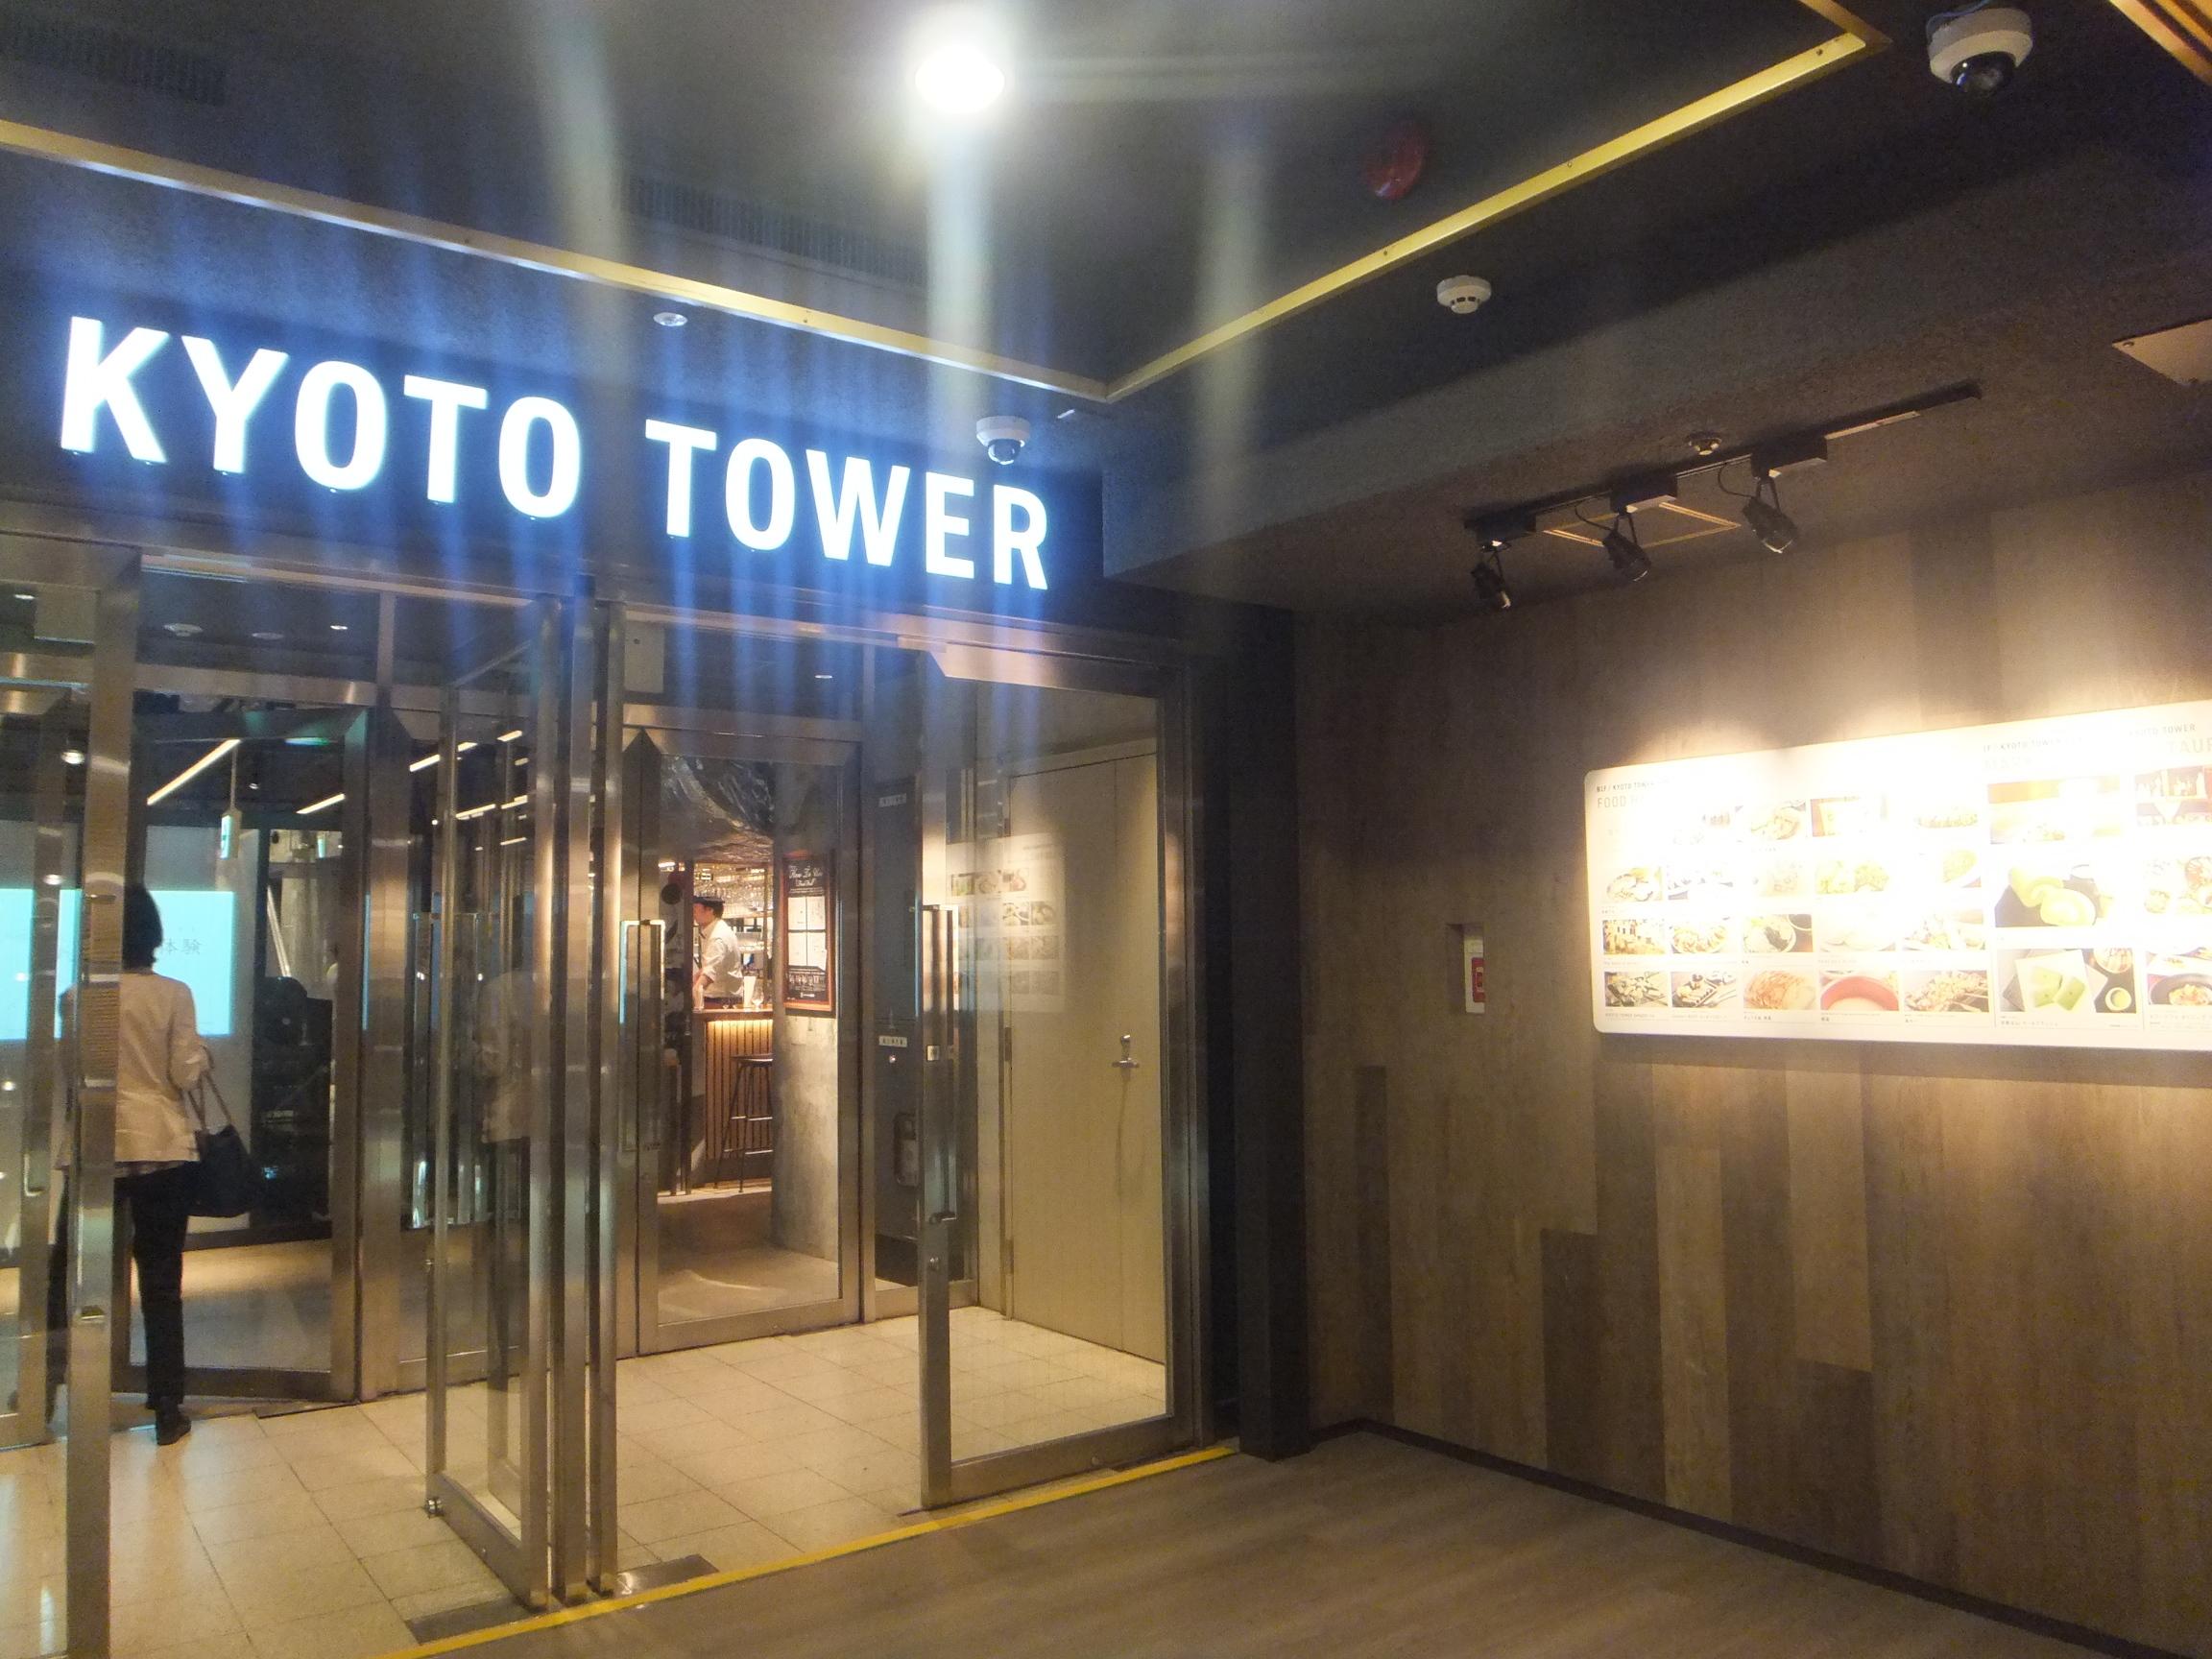 kyototower1.jpg